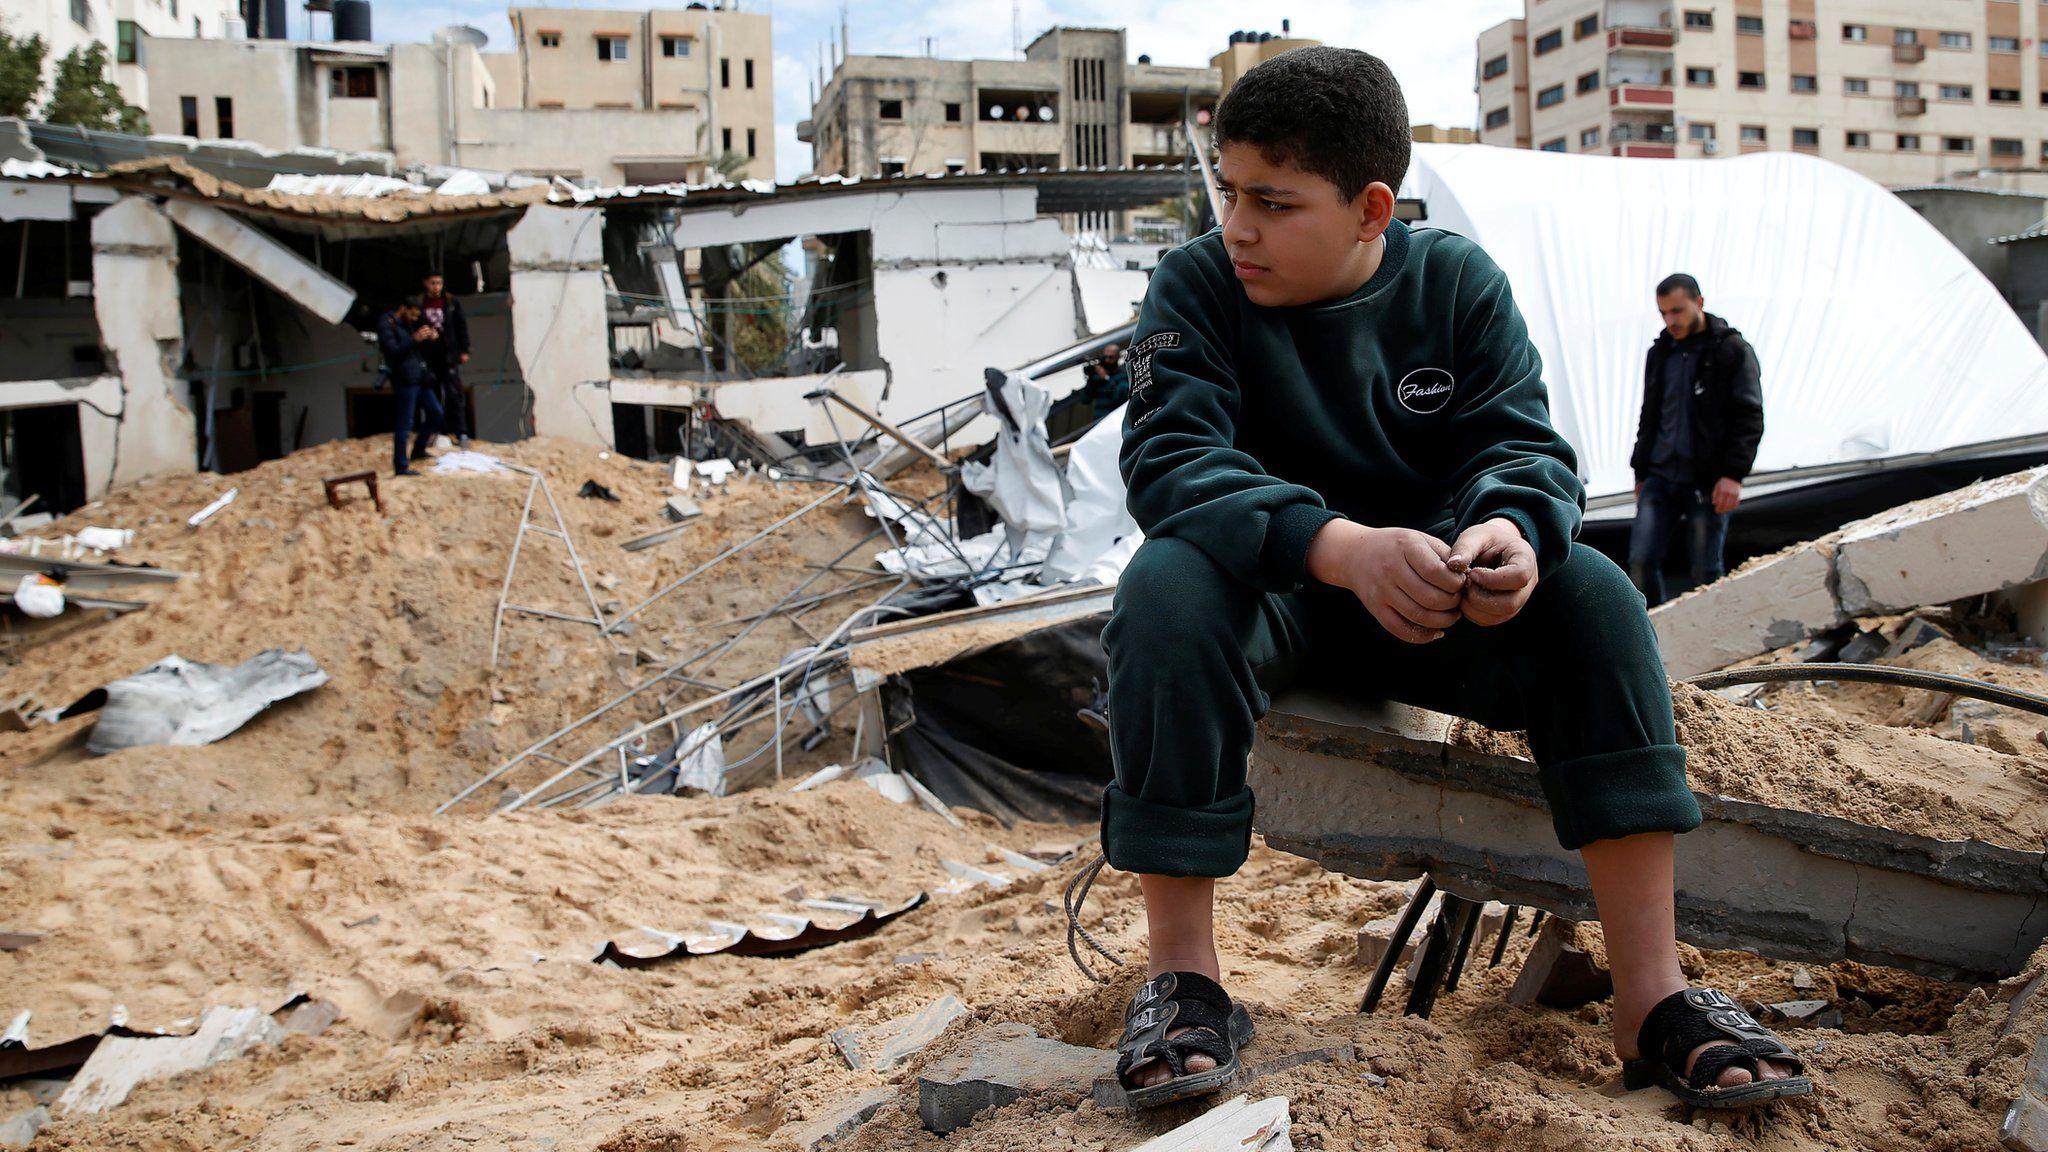 A Palestinian boy sits near a Hamas site in Gaza City destroyed in an Israeli air strike (15 March 2019)